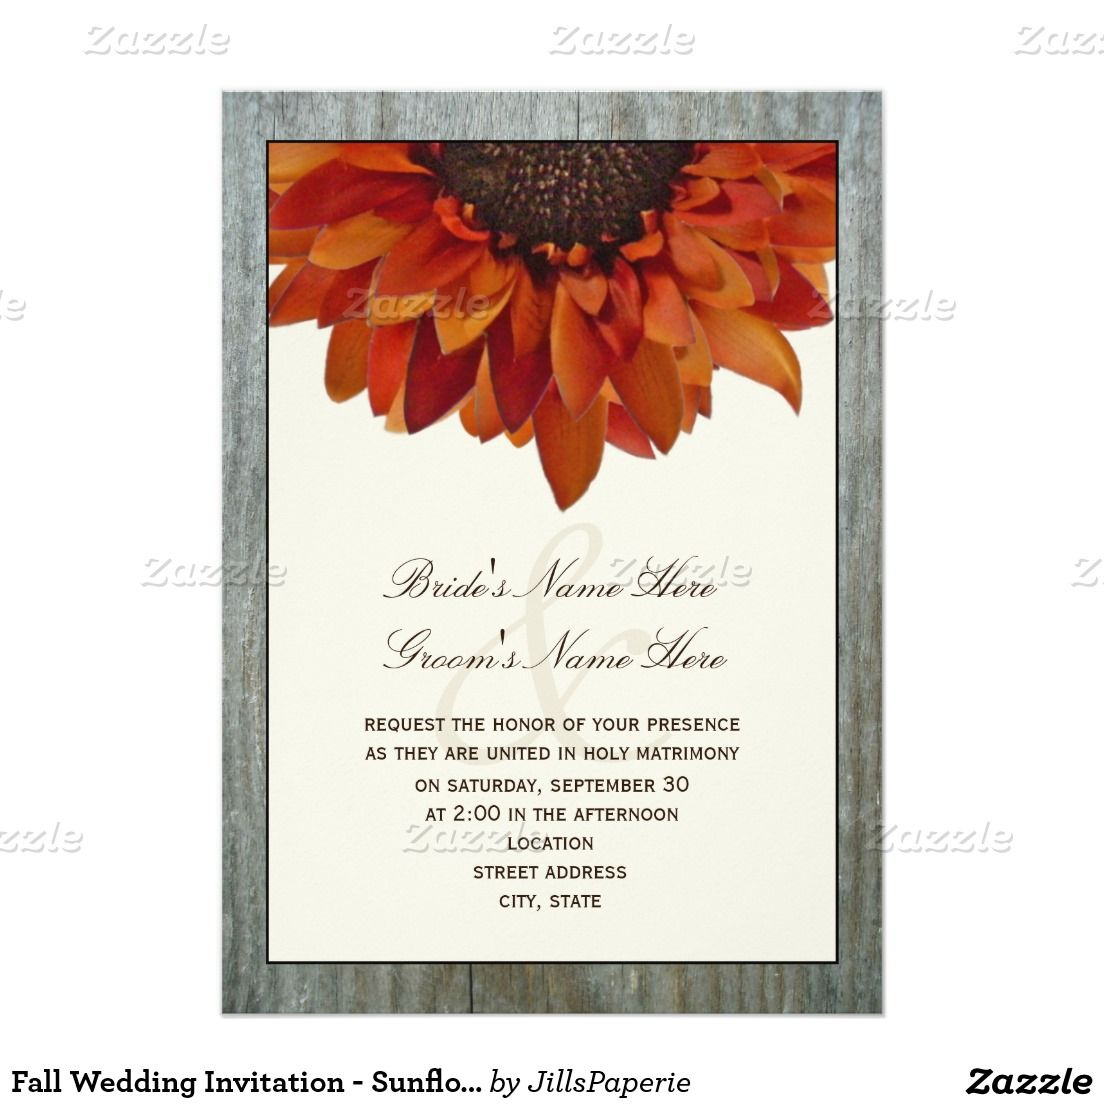 Fall Wedding Invitation - Sunflower & Barnwood | Autumn wedding ...